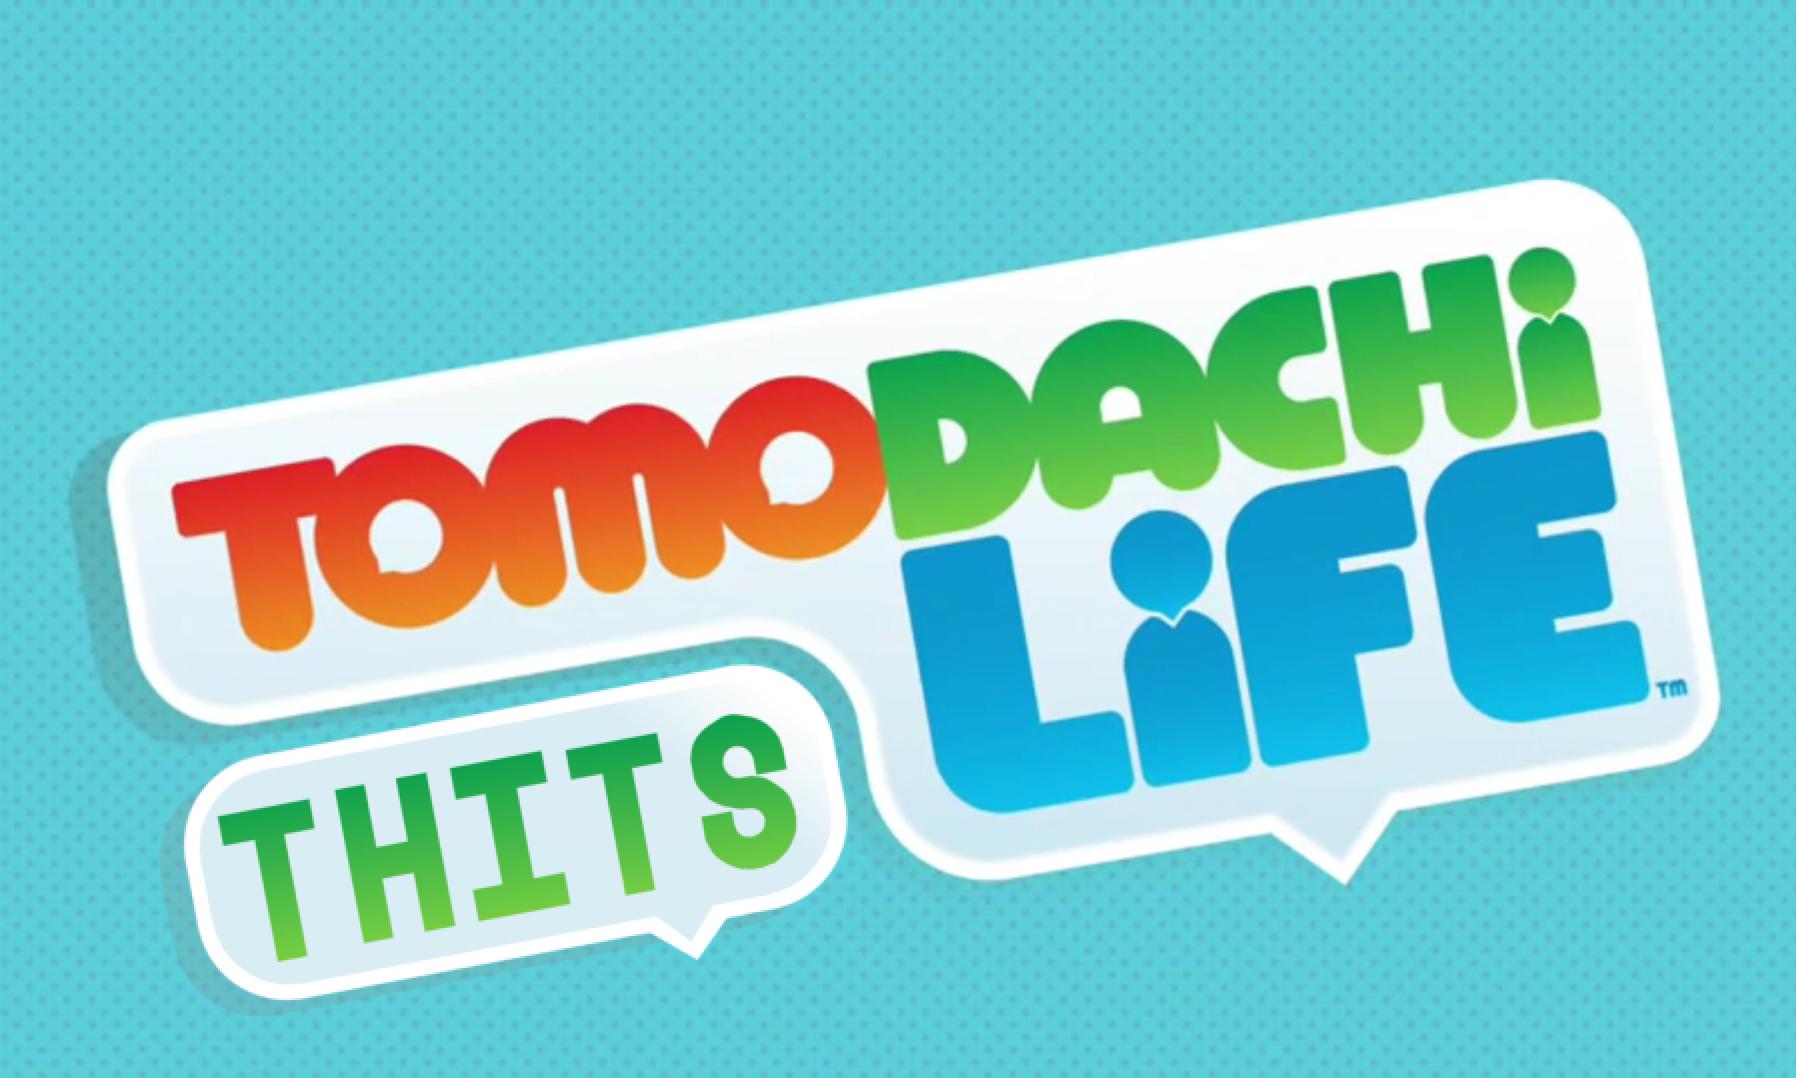 THITS: Tomodachi Life.